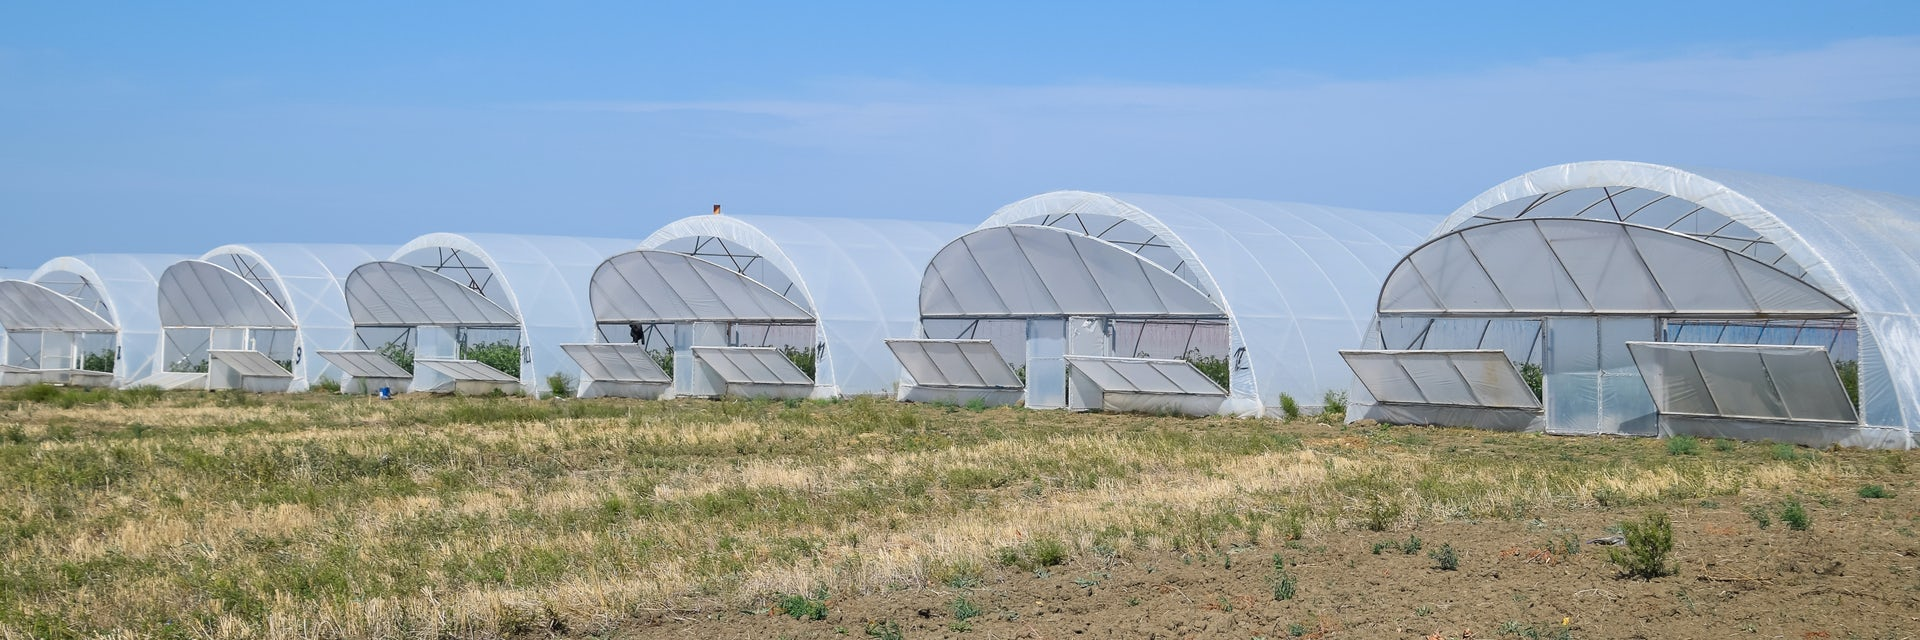 Greenhouses ventilation desert project